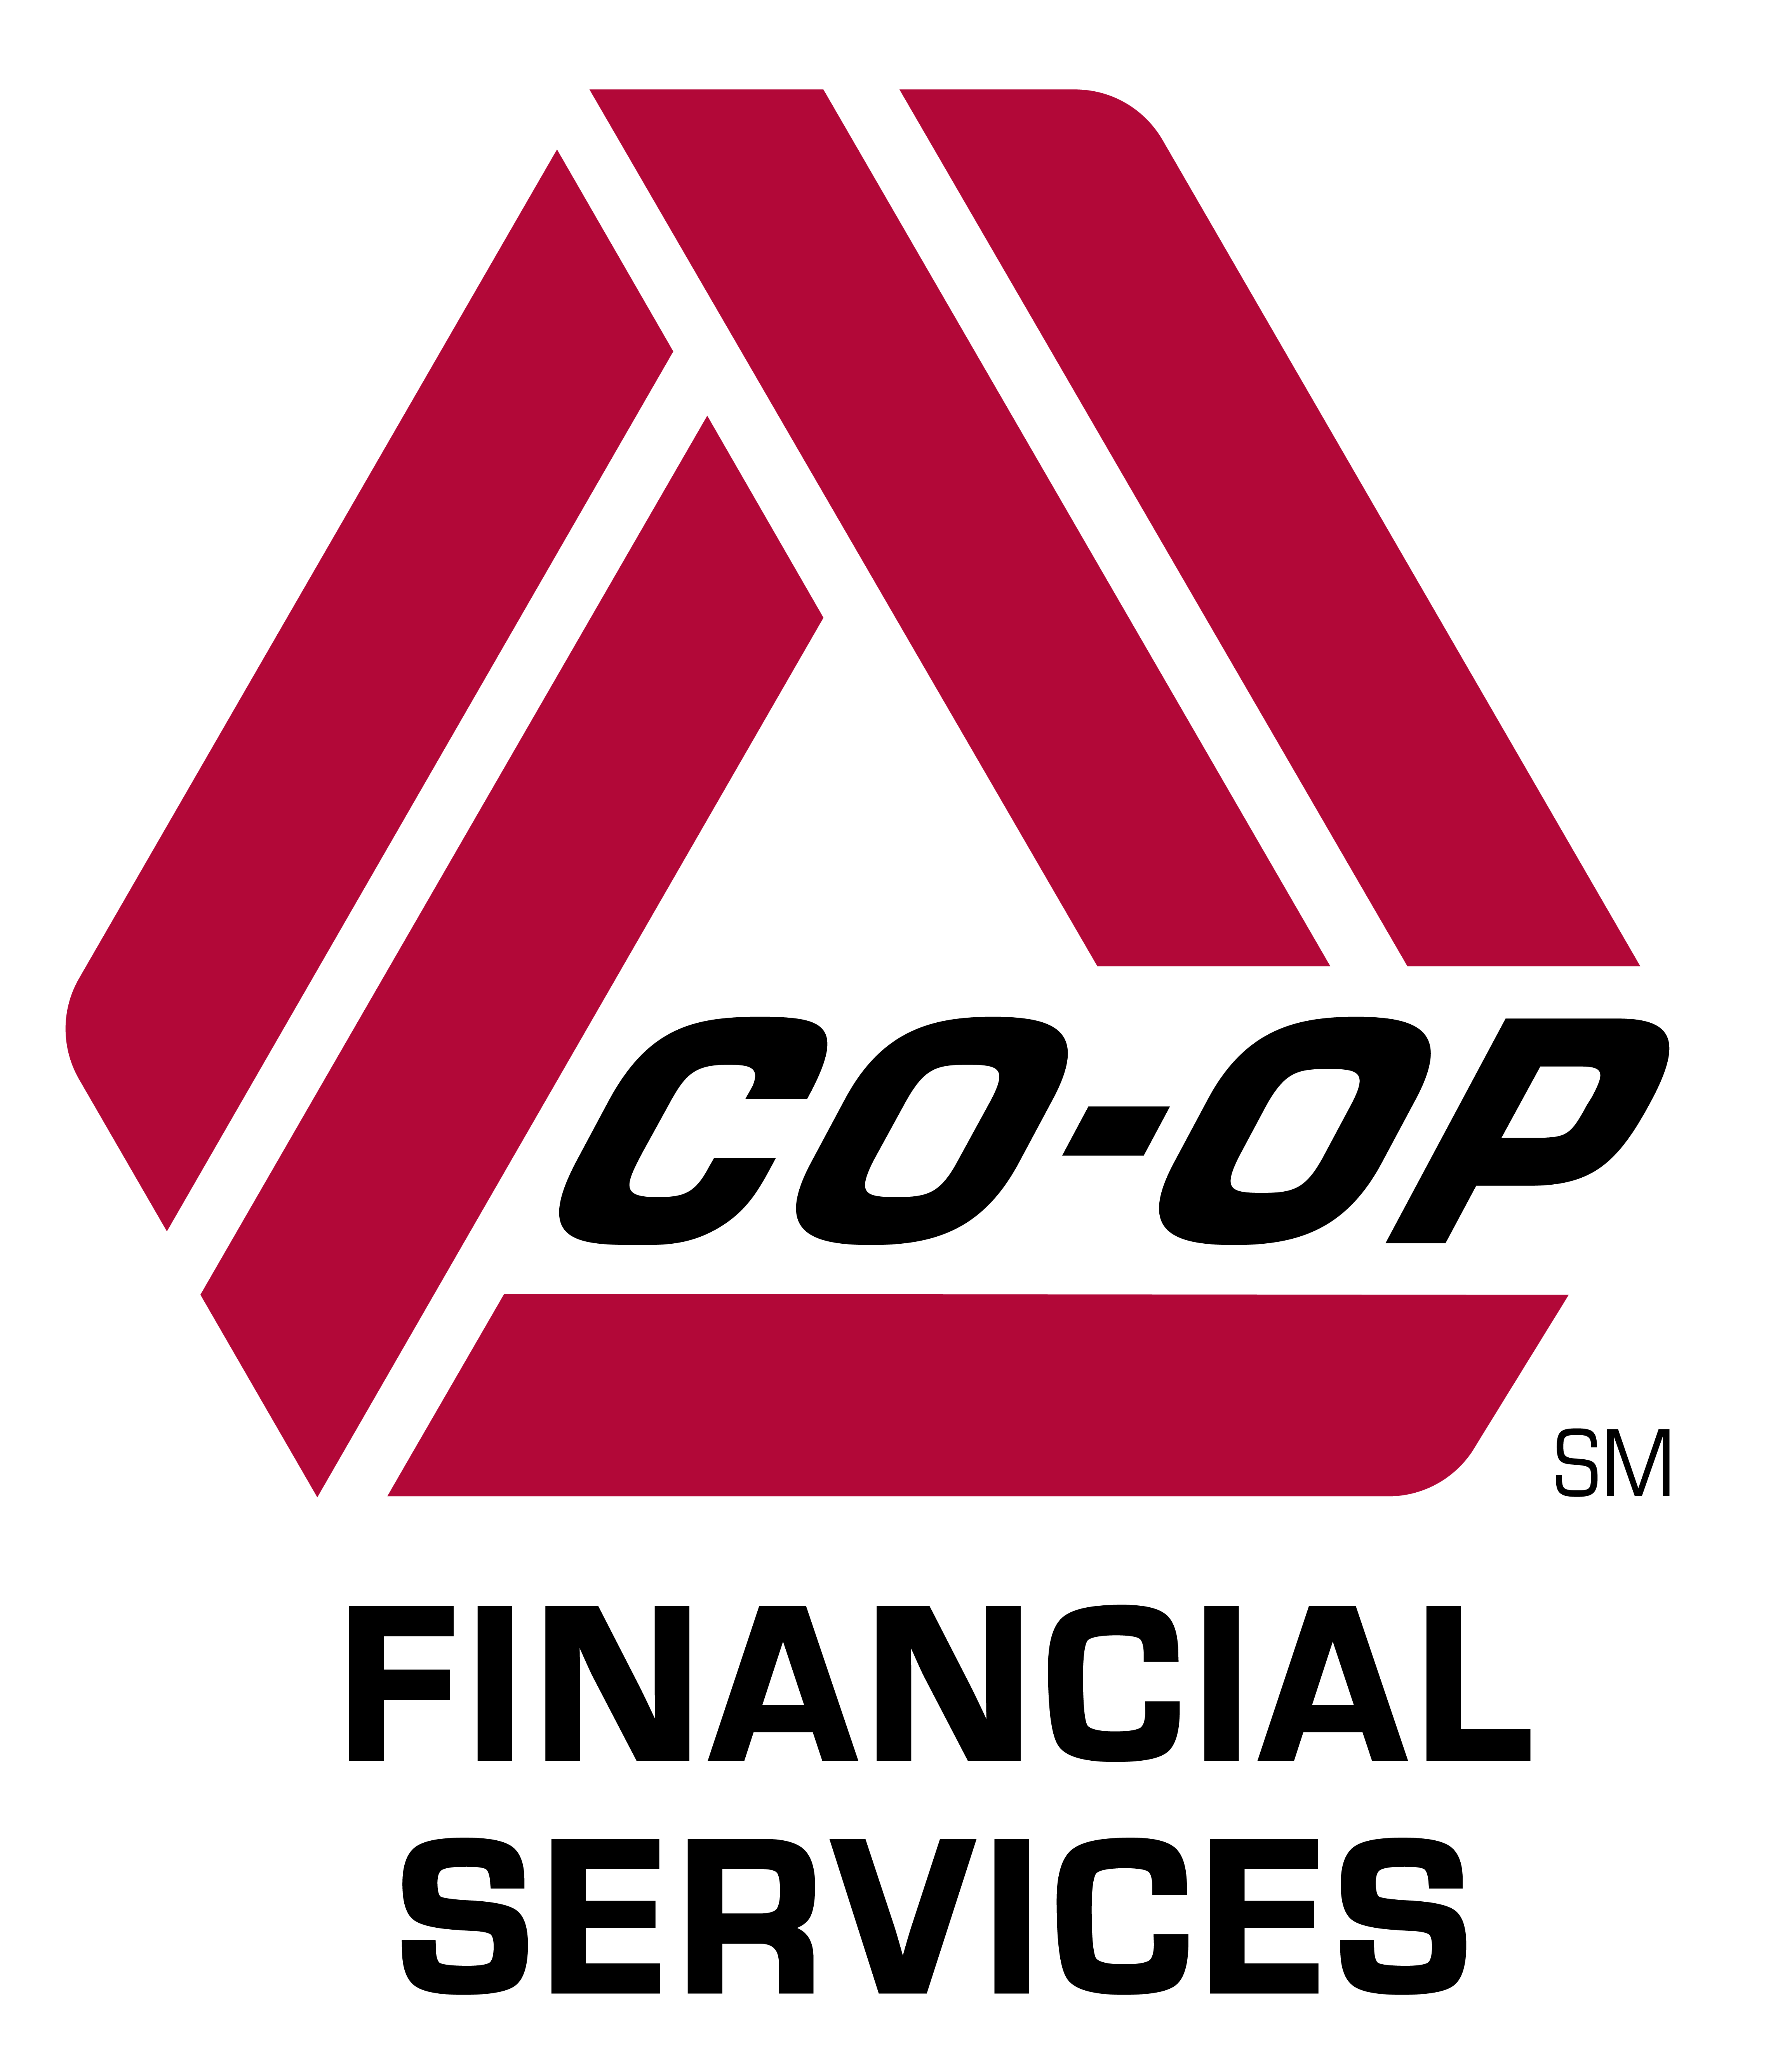 CO-OP_FS_logo_300ppi_CMYK